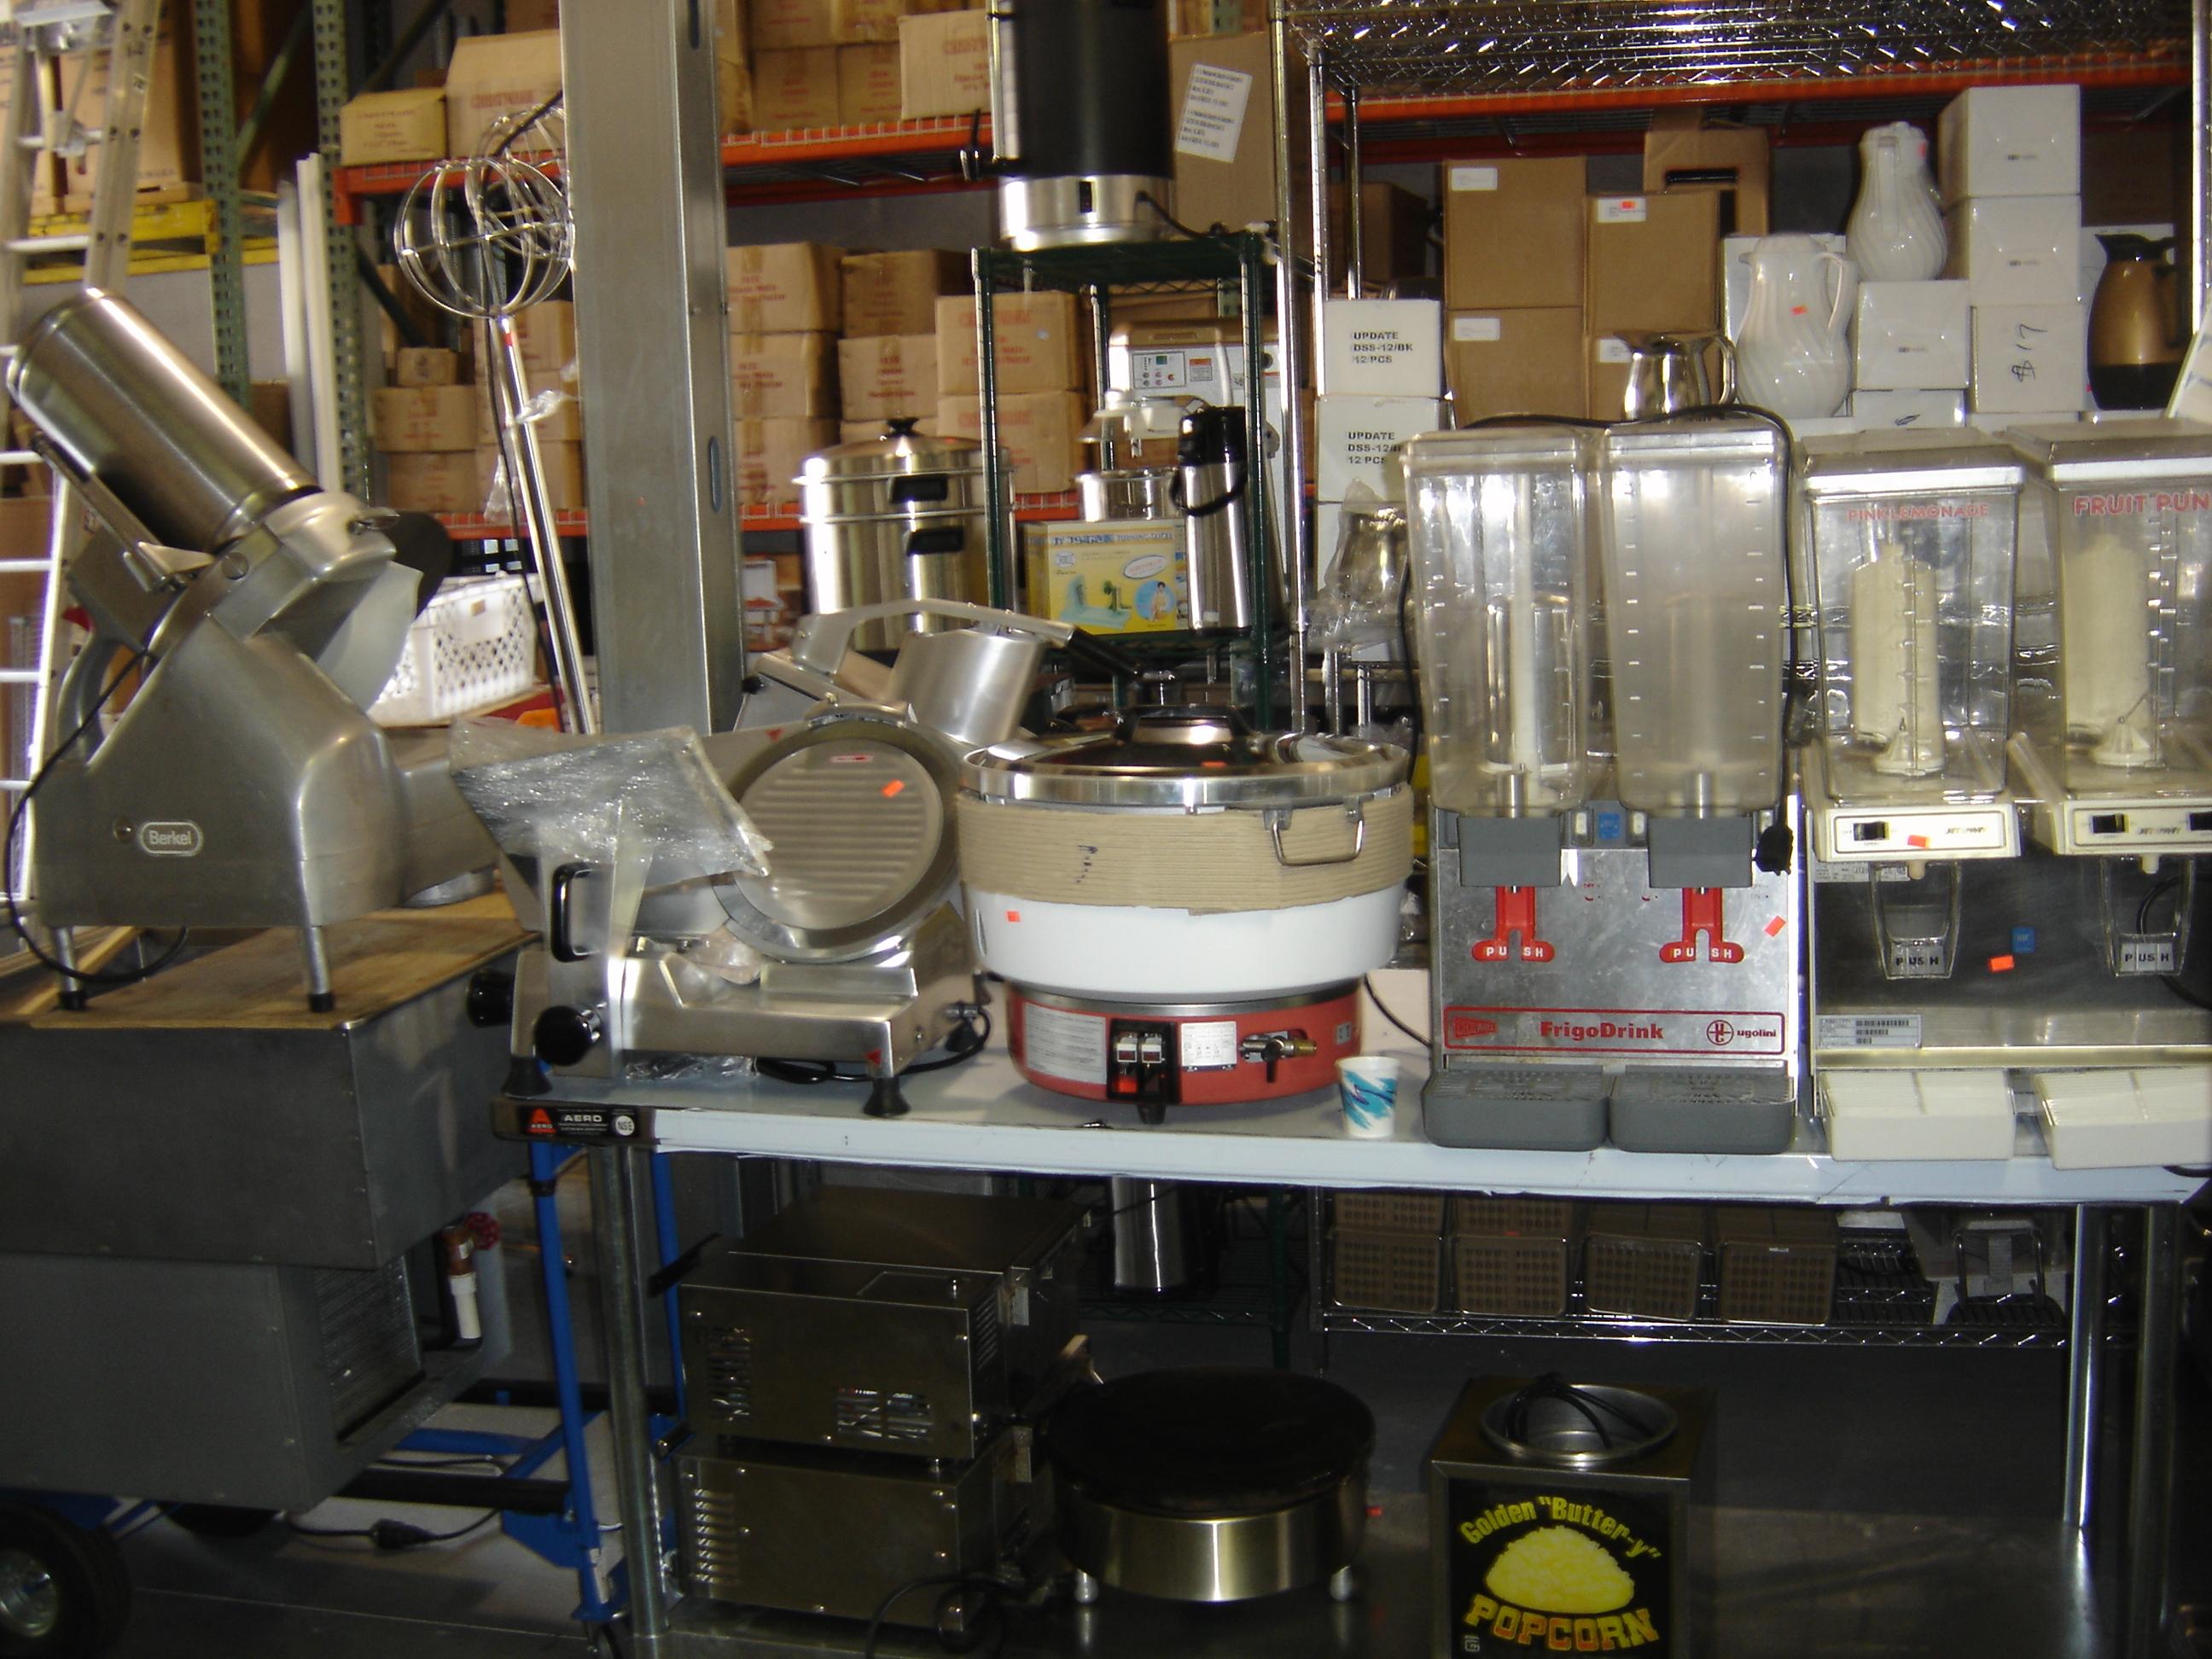 Restaurant supply restaurant supply equipment for Equipement resto plus